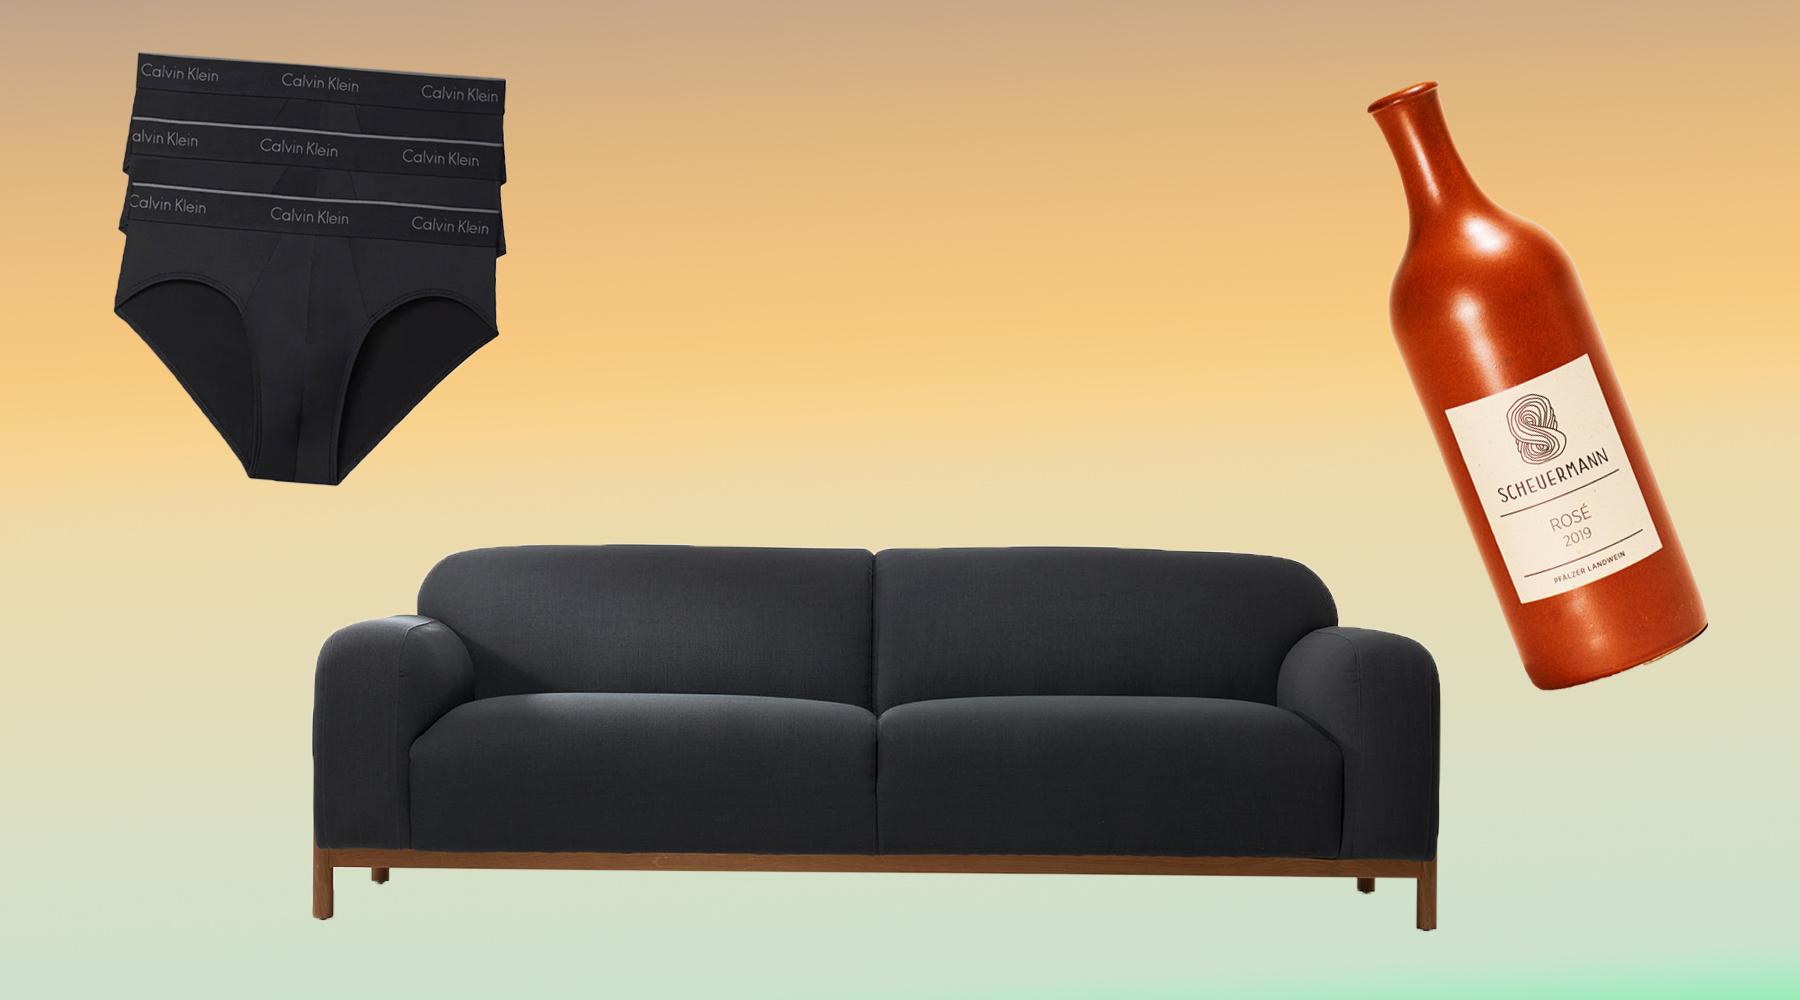 pantsdrunk-collage-1-minimalist-b.jpg